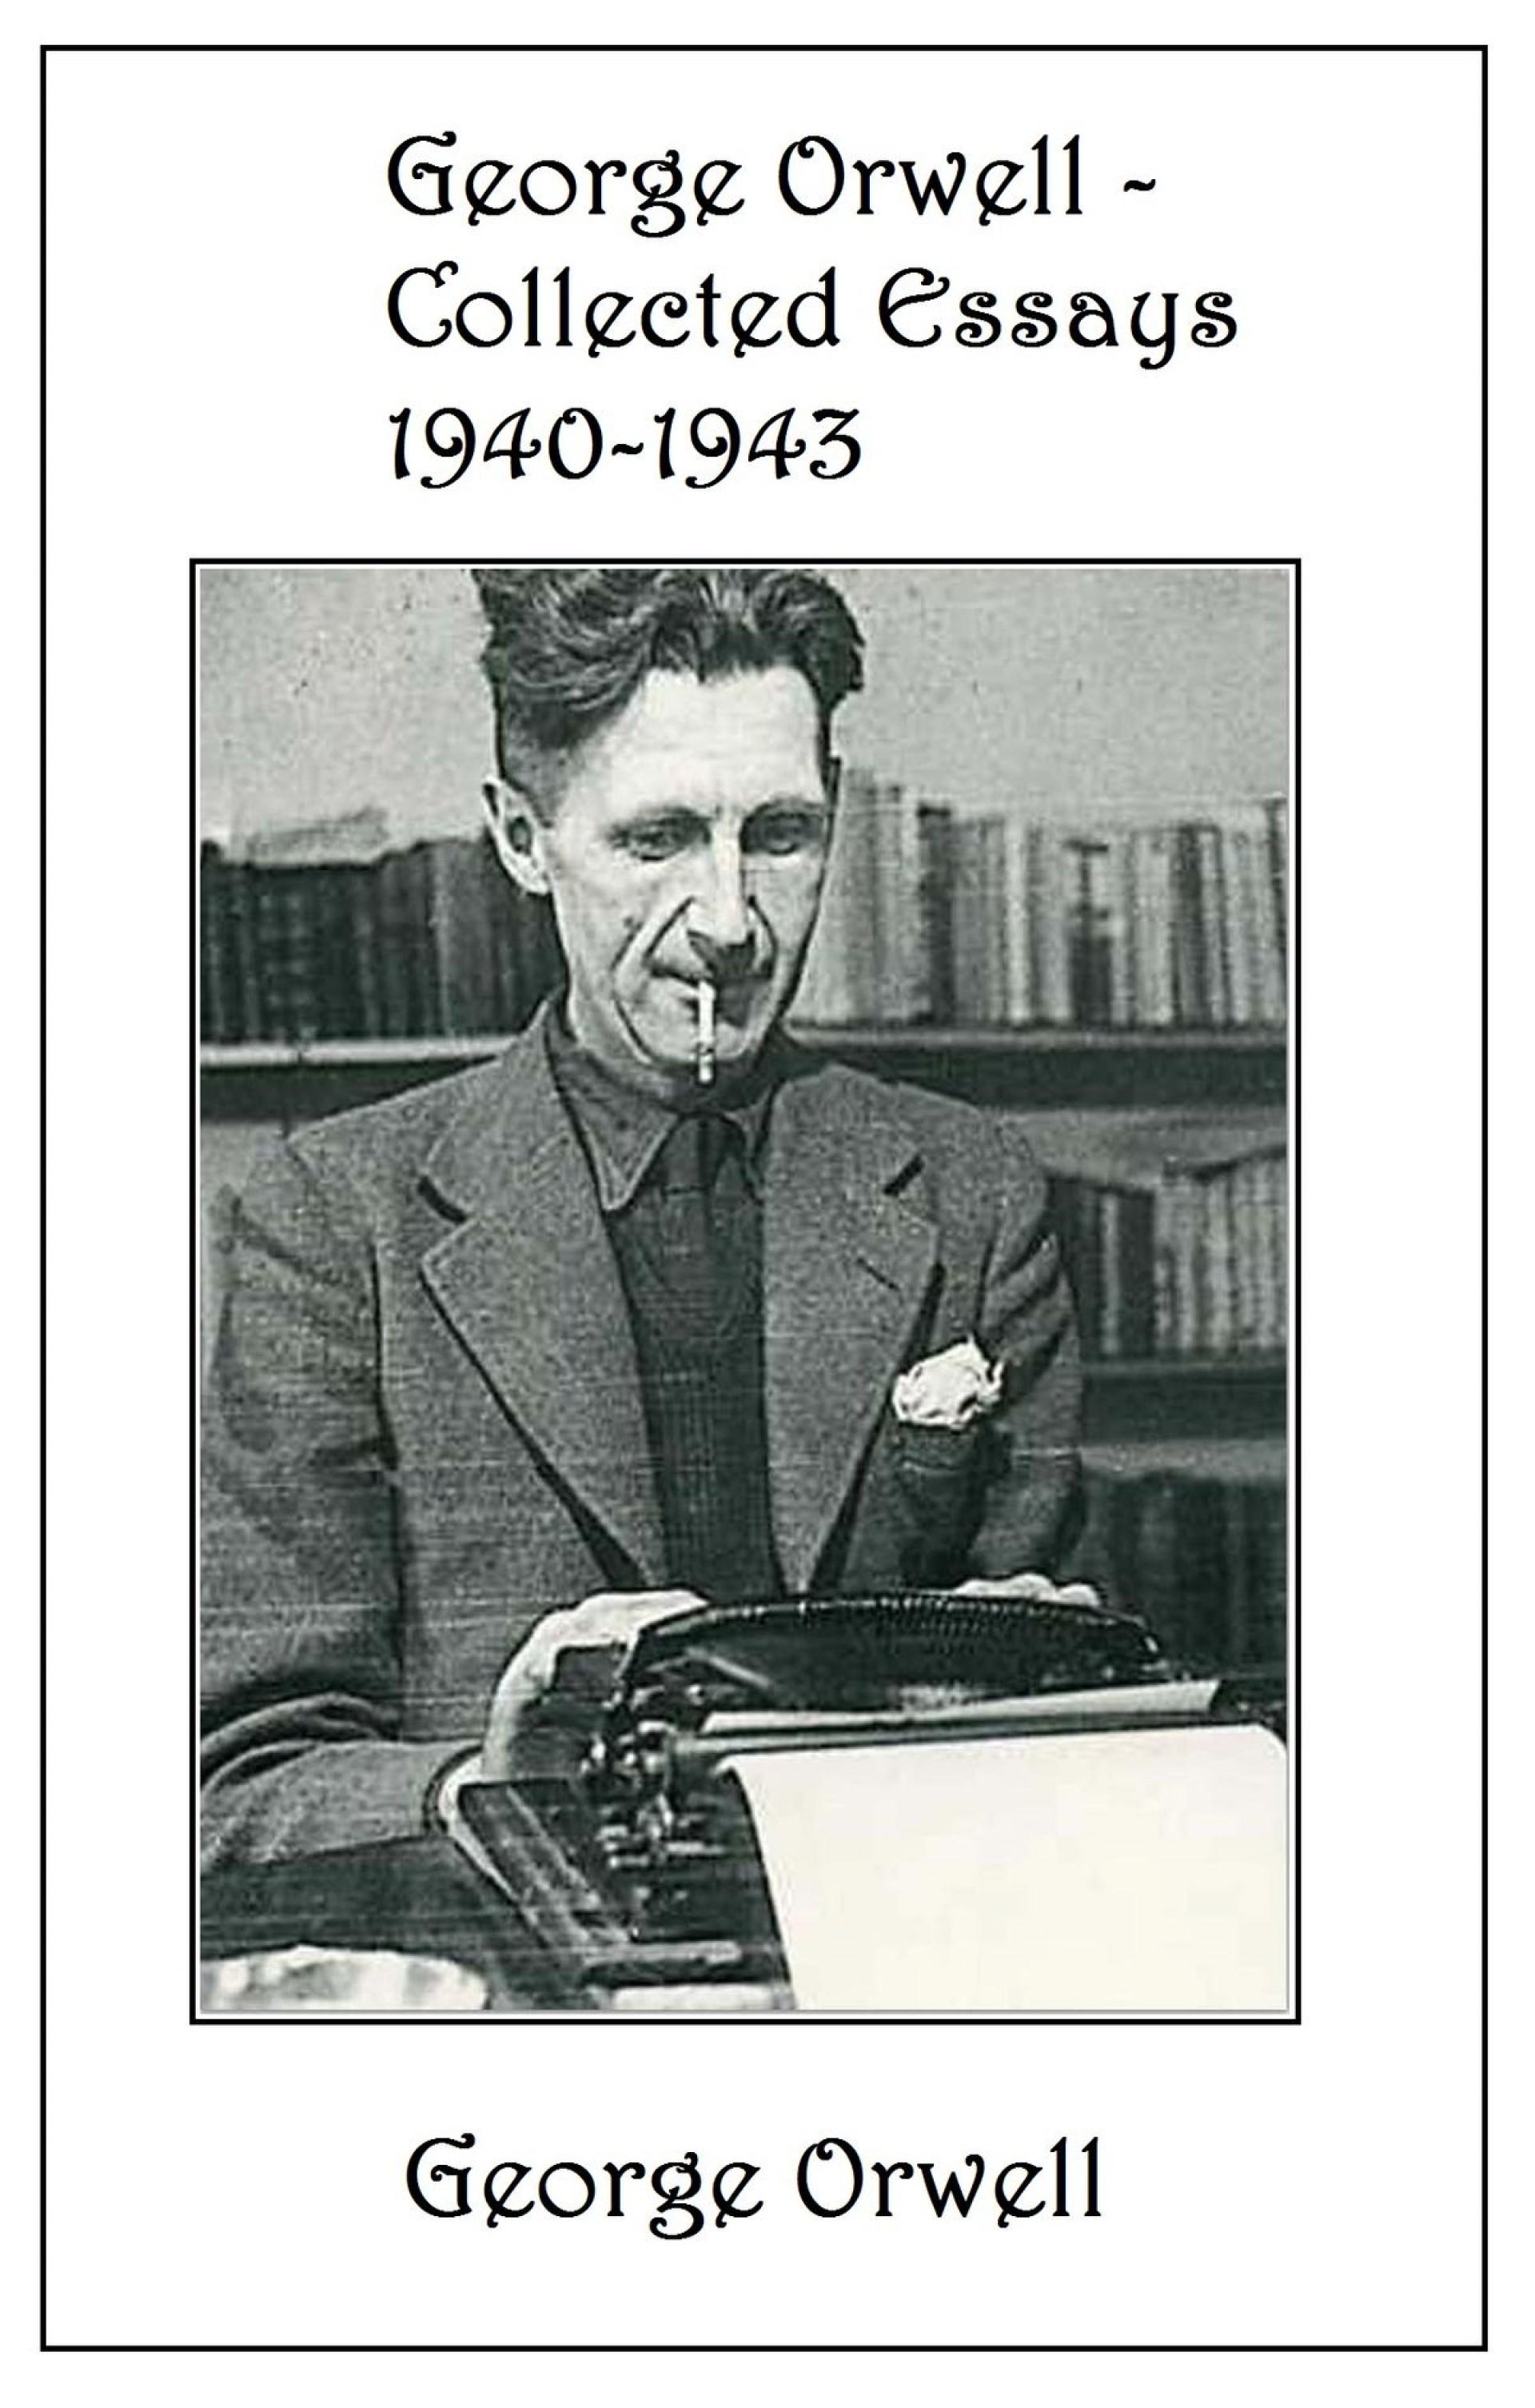 002 George Orwell Collected Essays Essay Frightening Everyman's Library Summary Bookshop Memories 1920